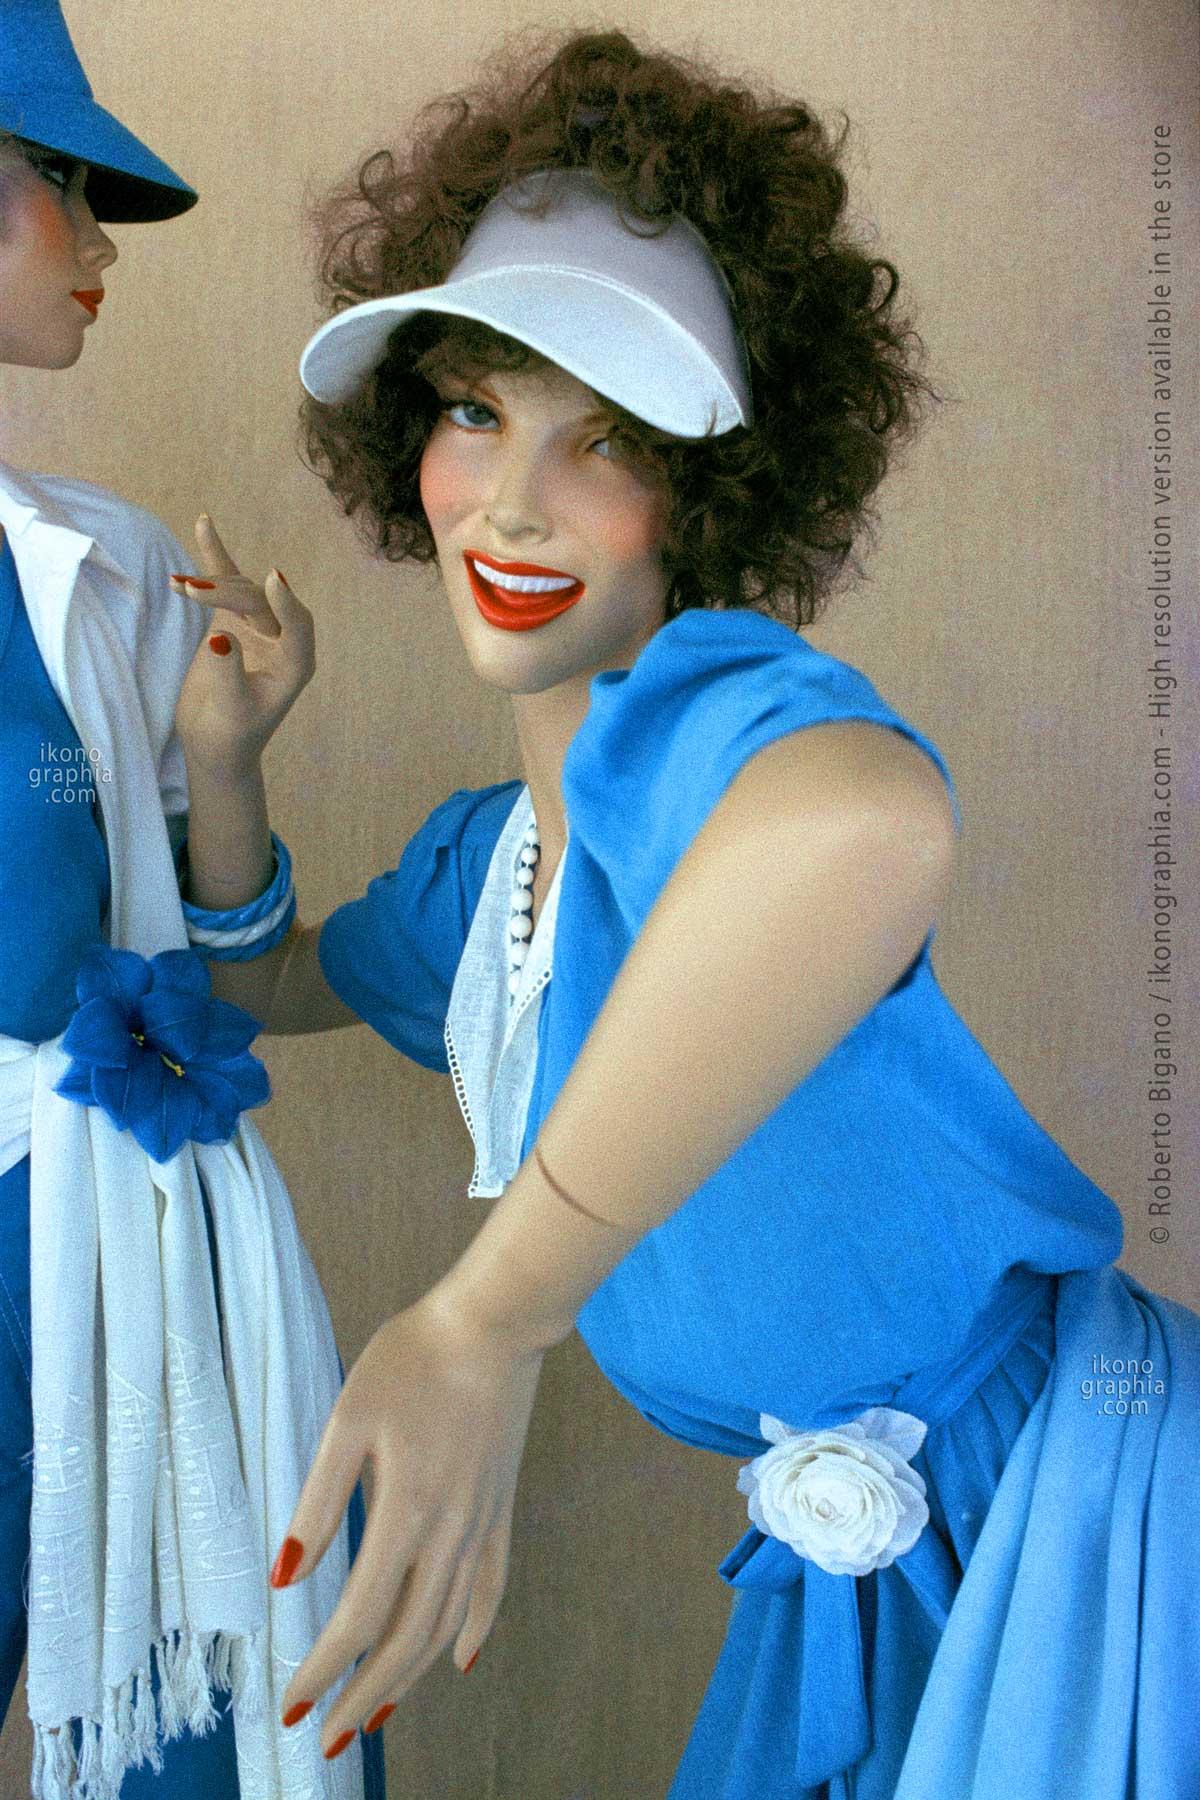 0462_38 Dummy in San Sebastian, Spain. 1980. Photo Roberto Bigano. Buy this image in the ikonographia.com store.